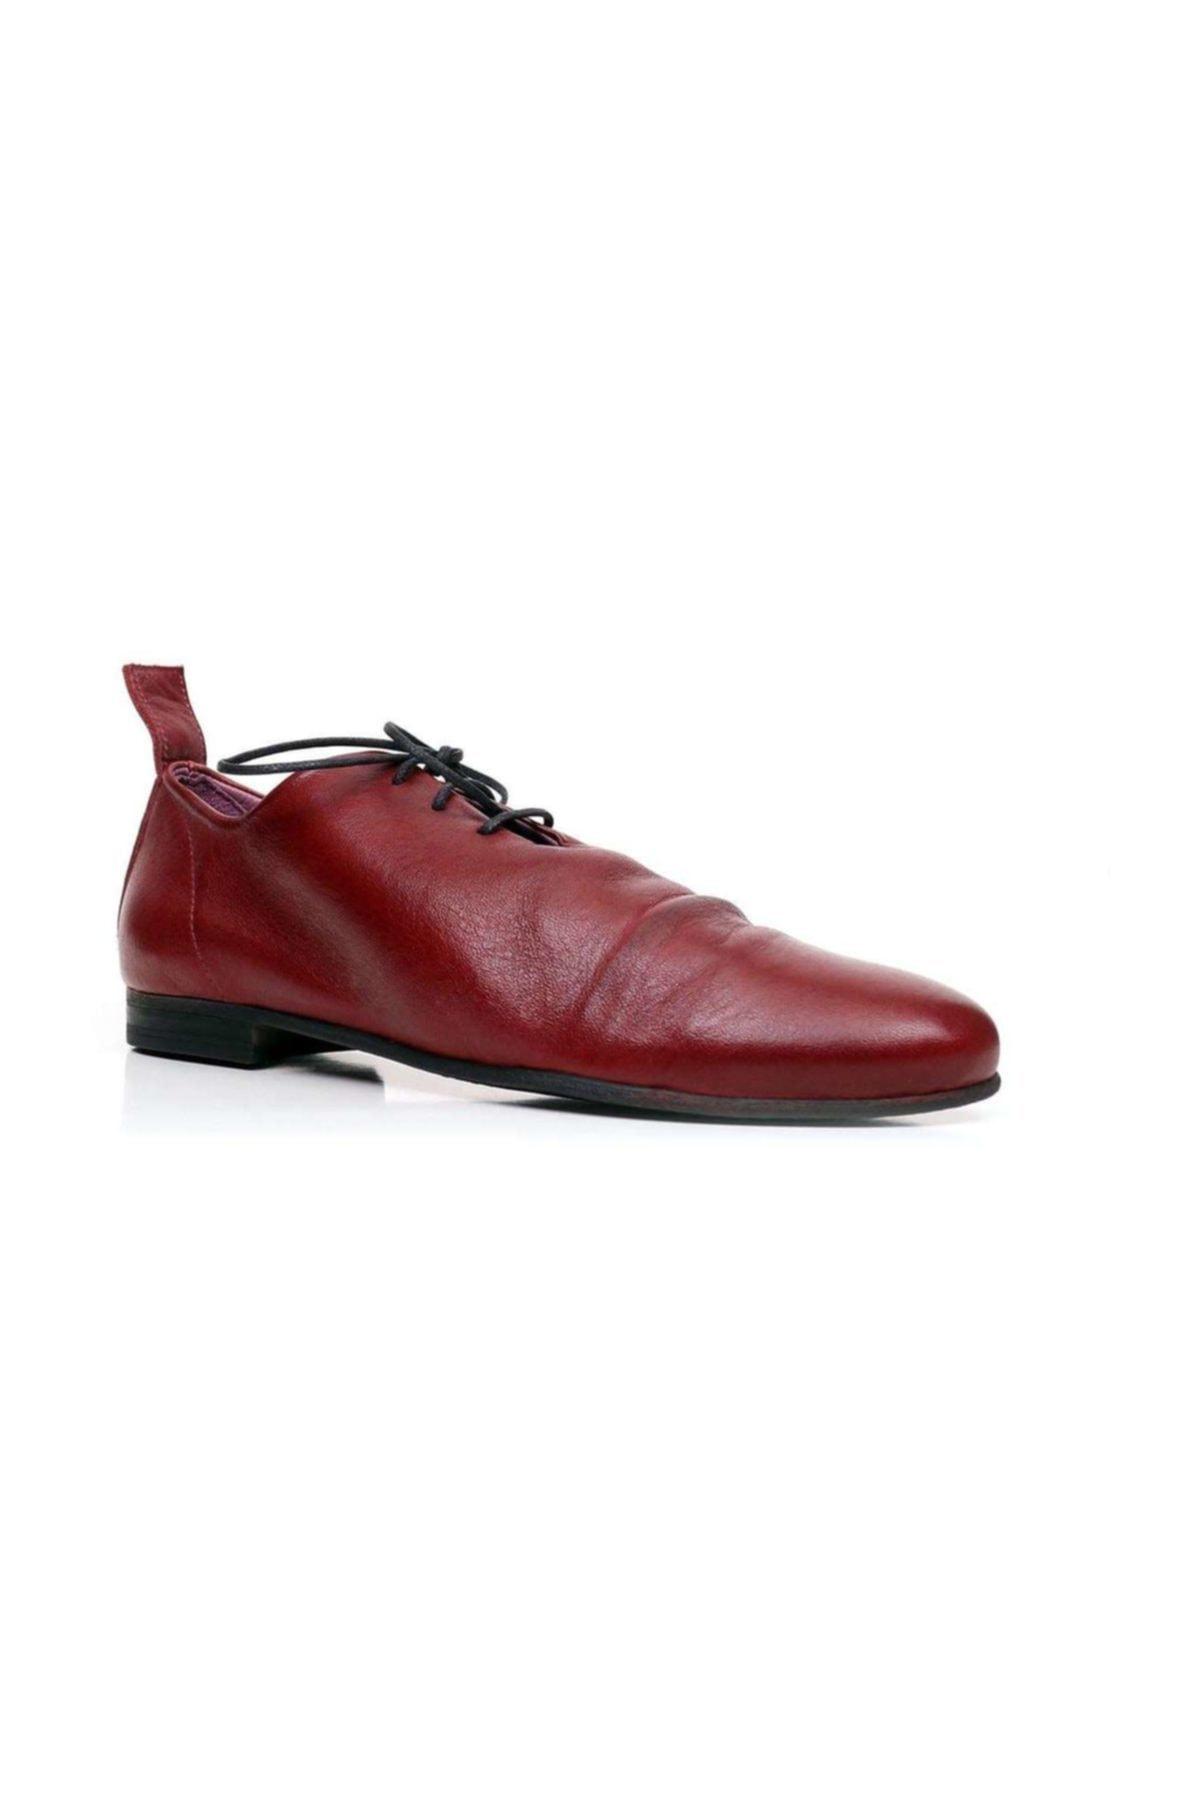 BUENO Shoes Kadın Ayakkabı 9p5914 2